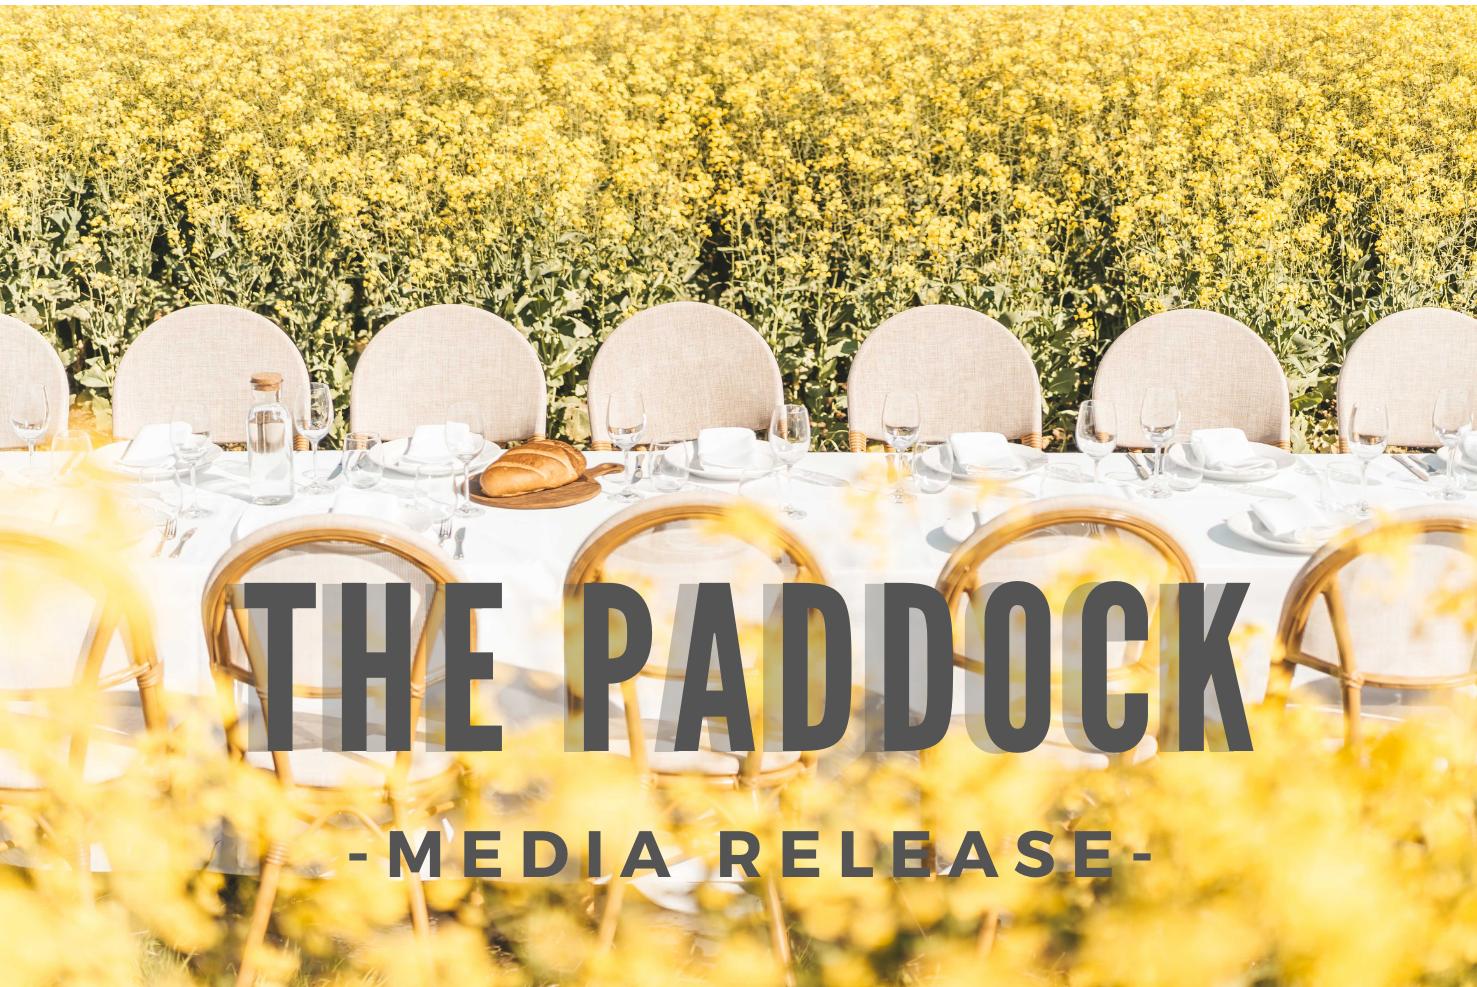 PADDOCK MEDIA RELEASE